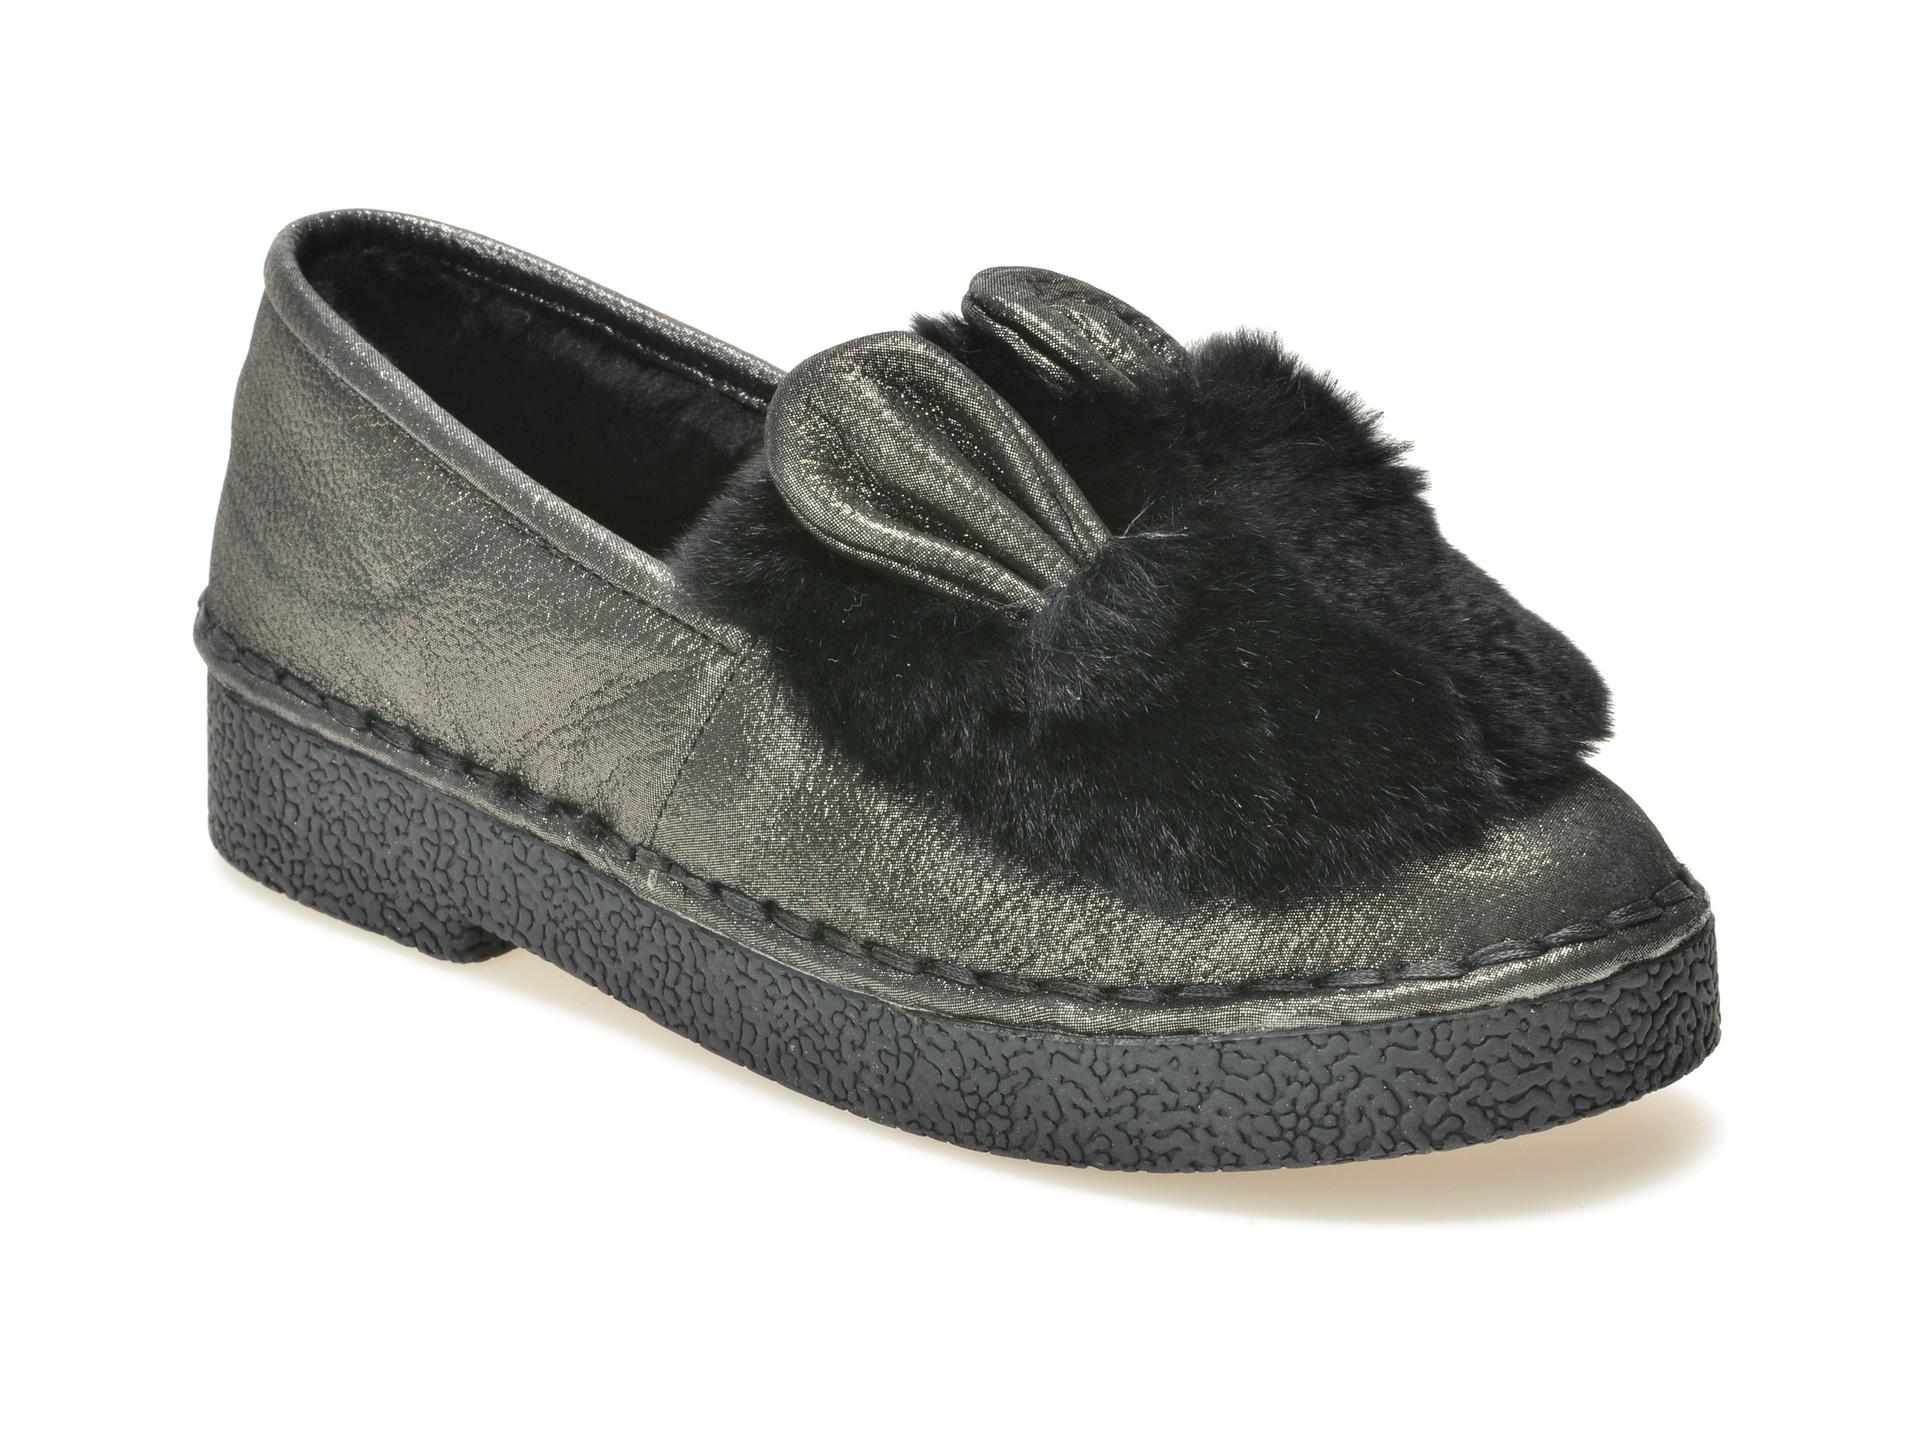 Pantofi FLAVIA PASSINI gri, Ag17169, din nabuc